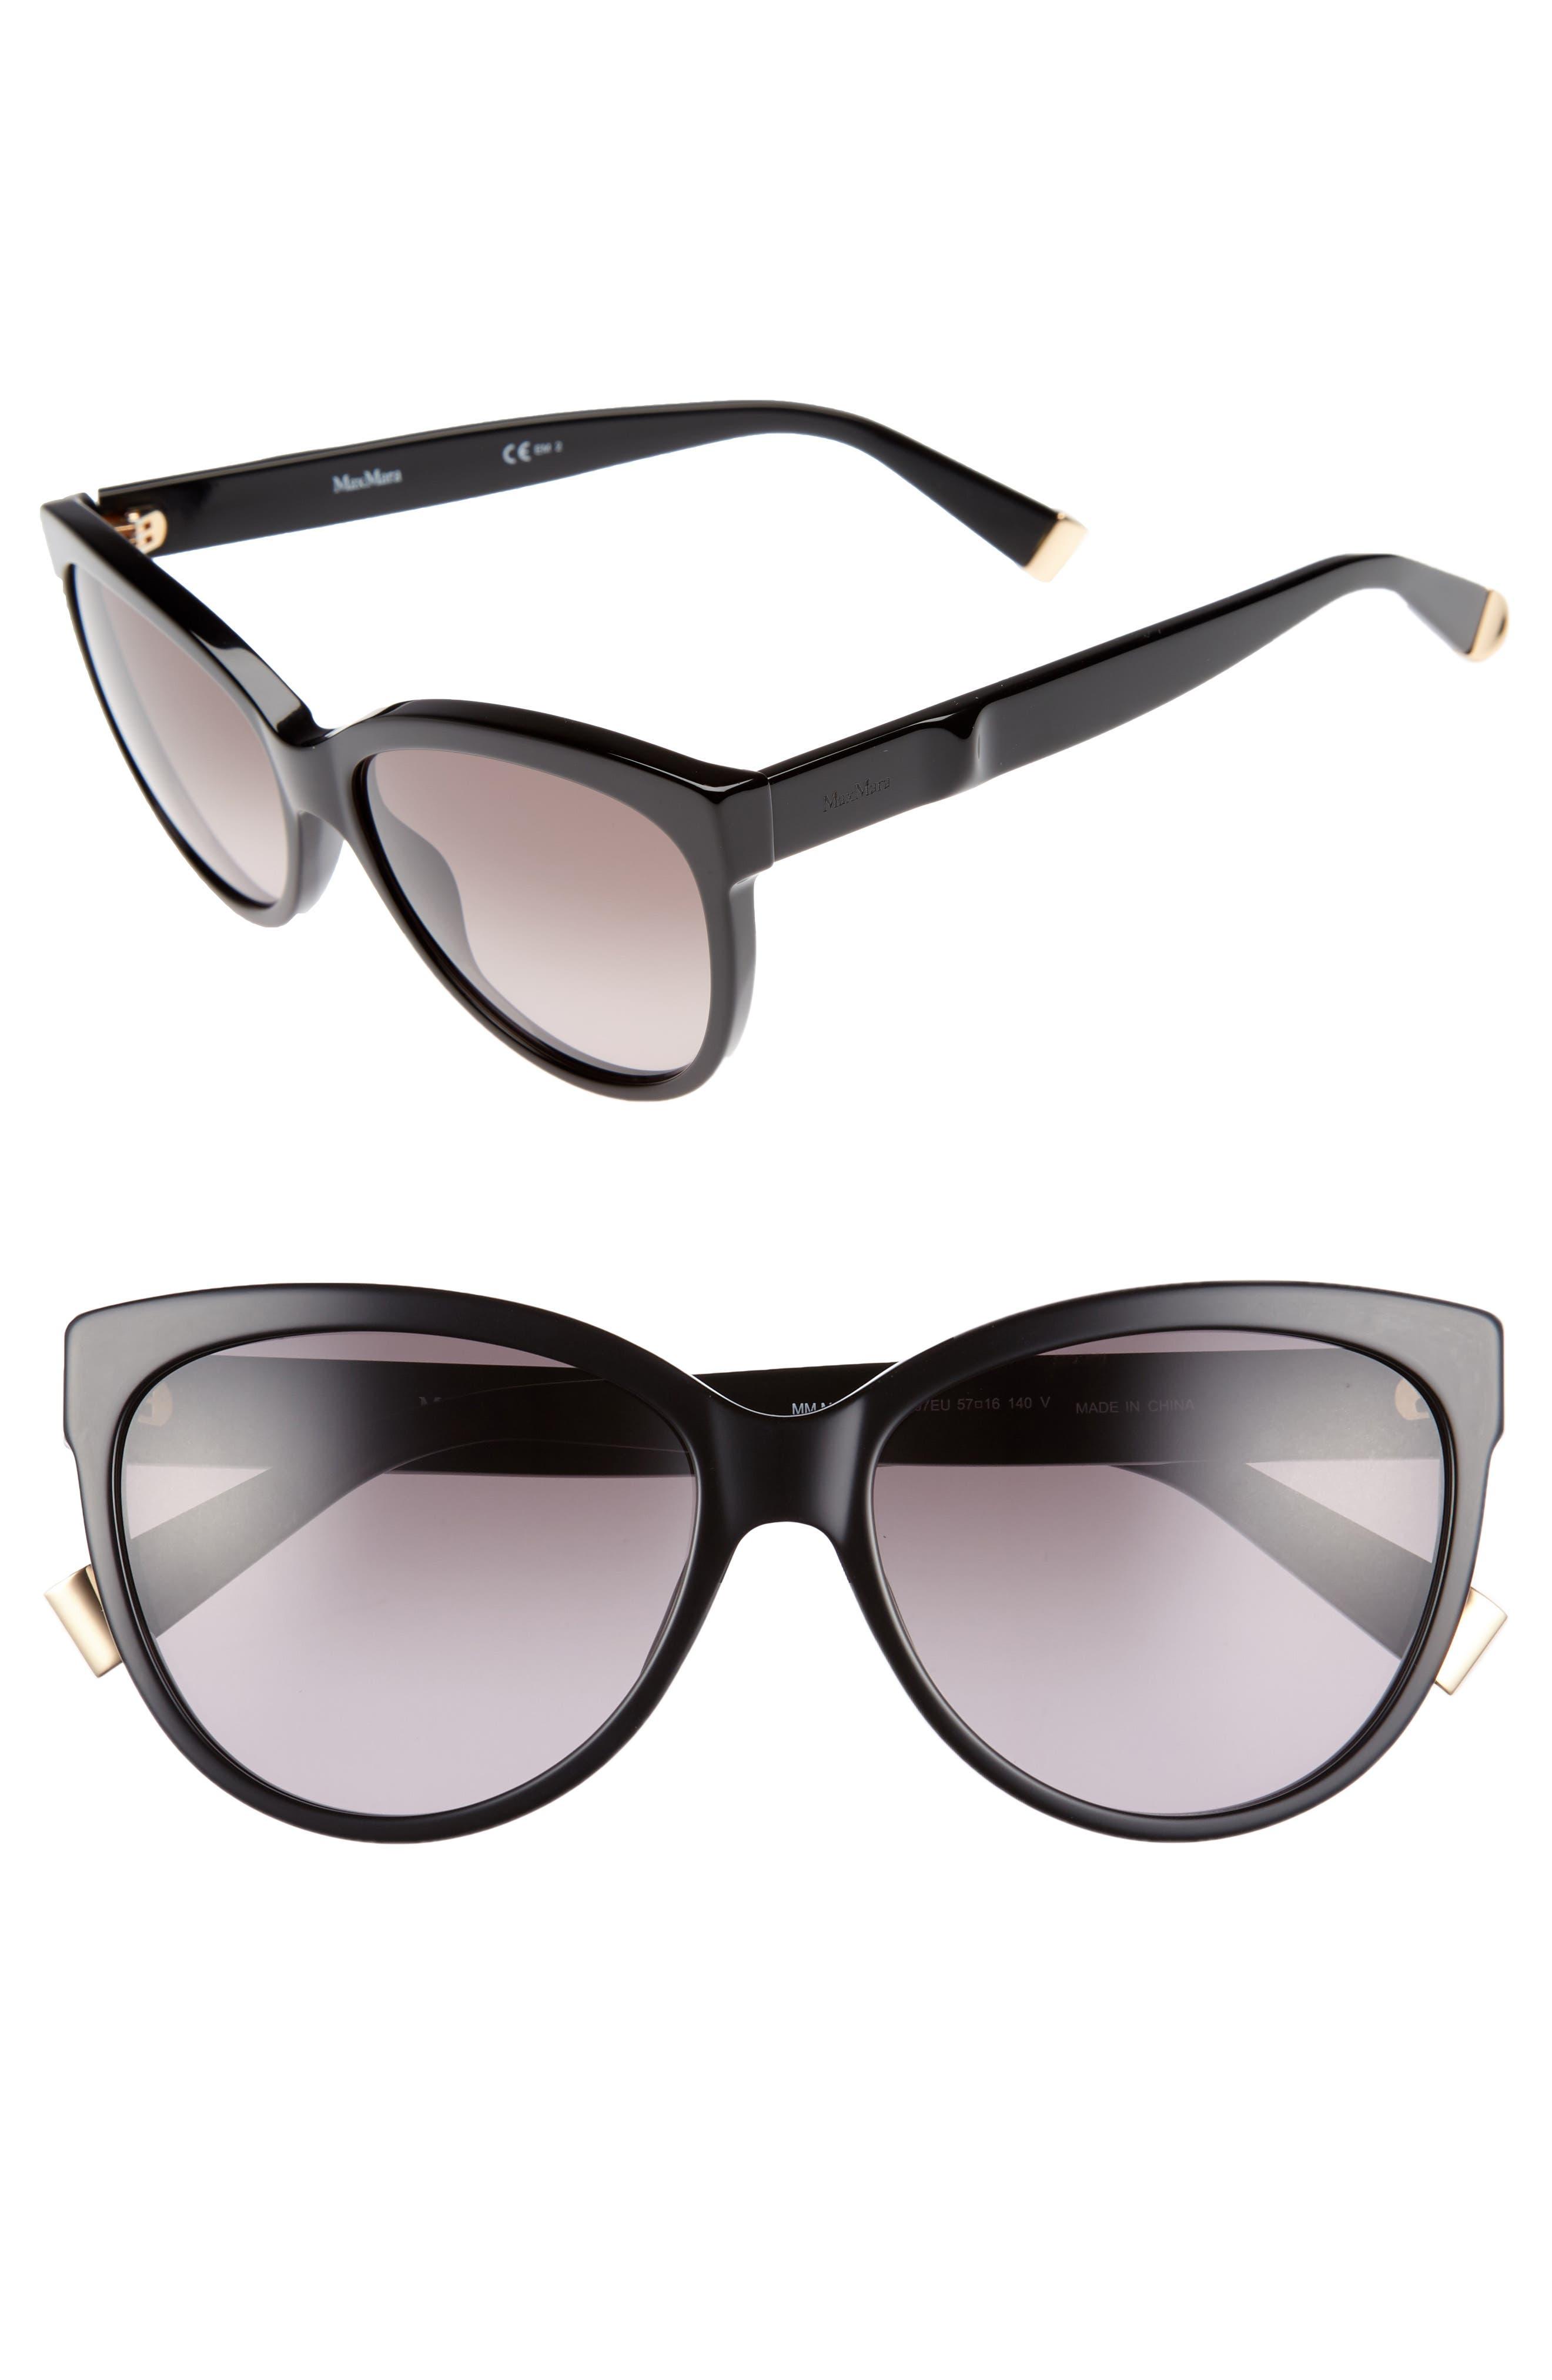 Moderii 57mm Gradient Cat Eye Sunglasses,                         Main,                         color, Black